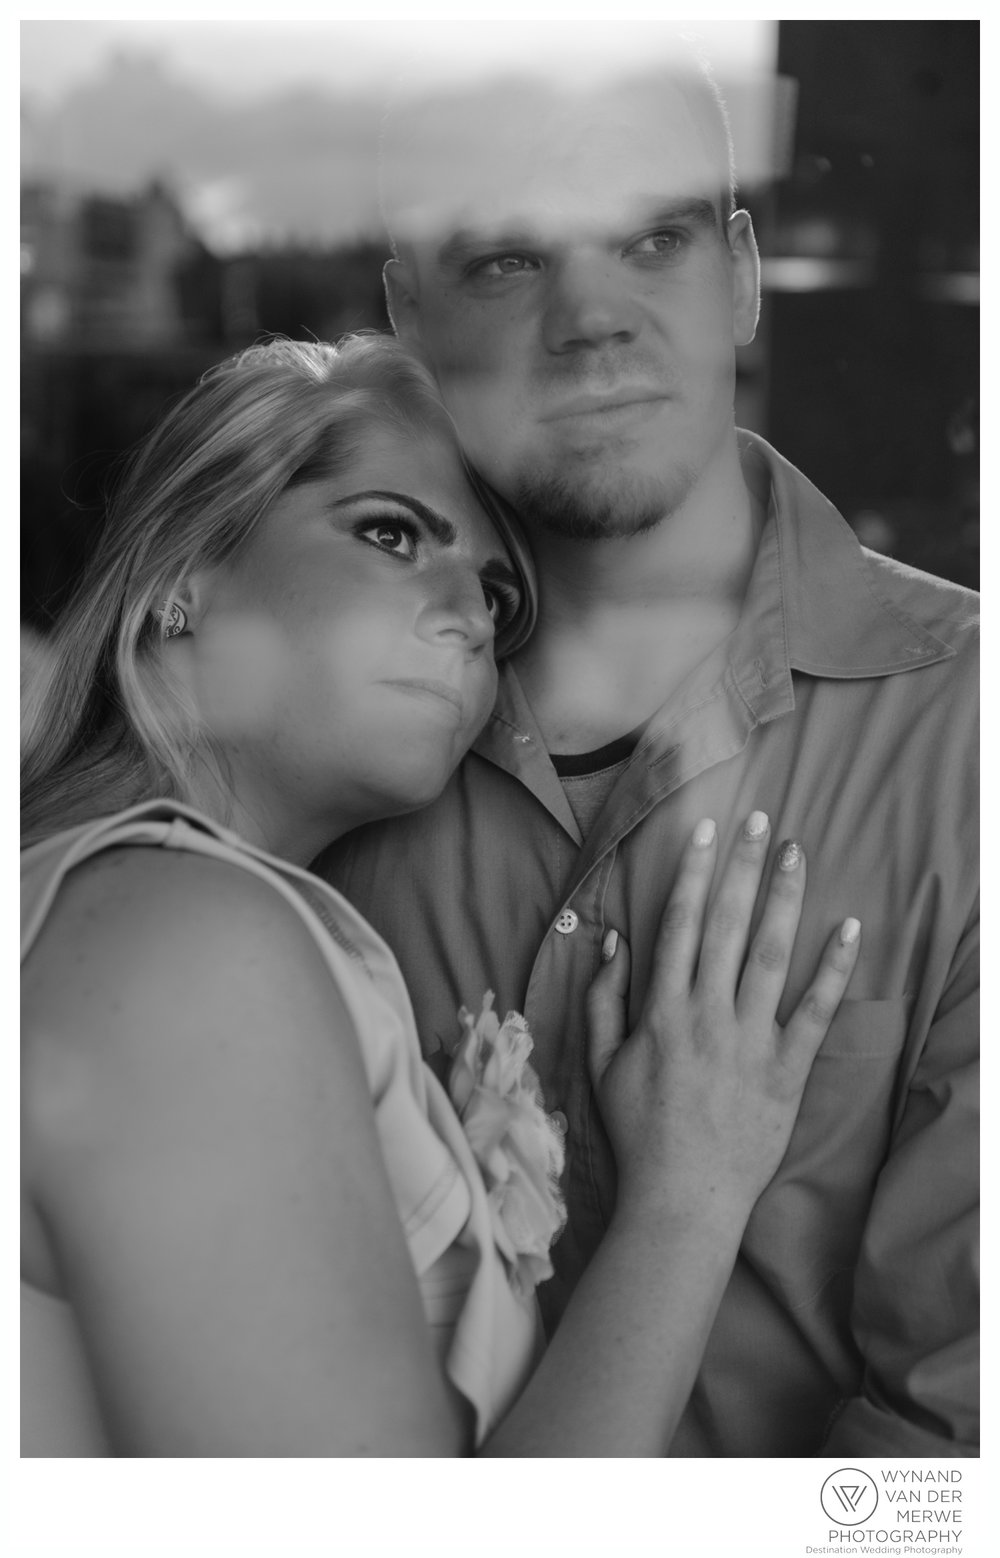 WynandvanderMerwe_weddingphotography_engagementshoot_icoffeeworks_industrial_romandityronne_gauteng_2018-67.jpg